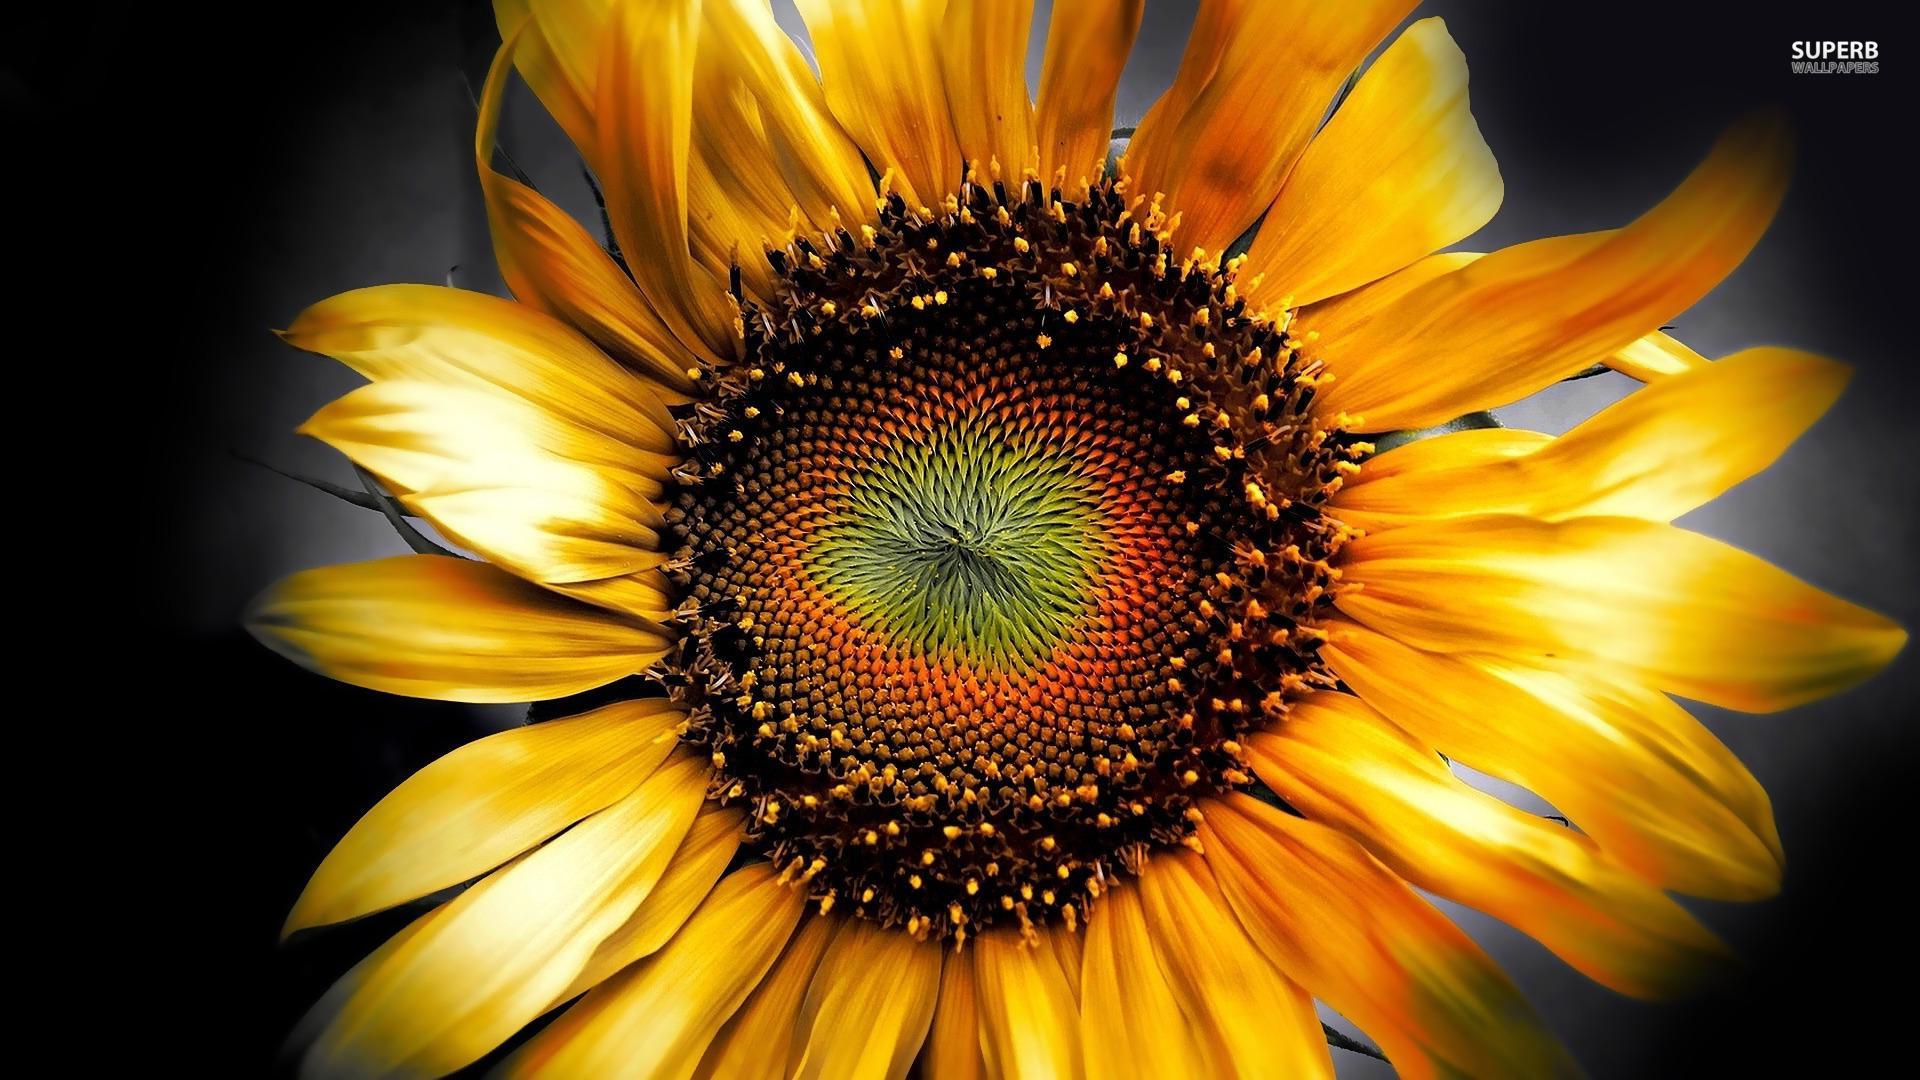 48+ Sunflower Screensaver and Wallpaper on WallpaperSafari